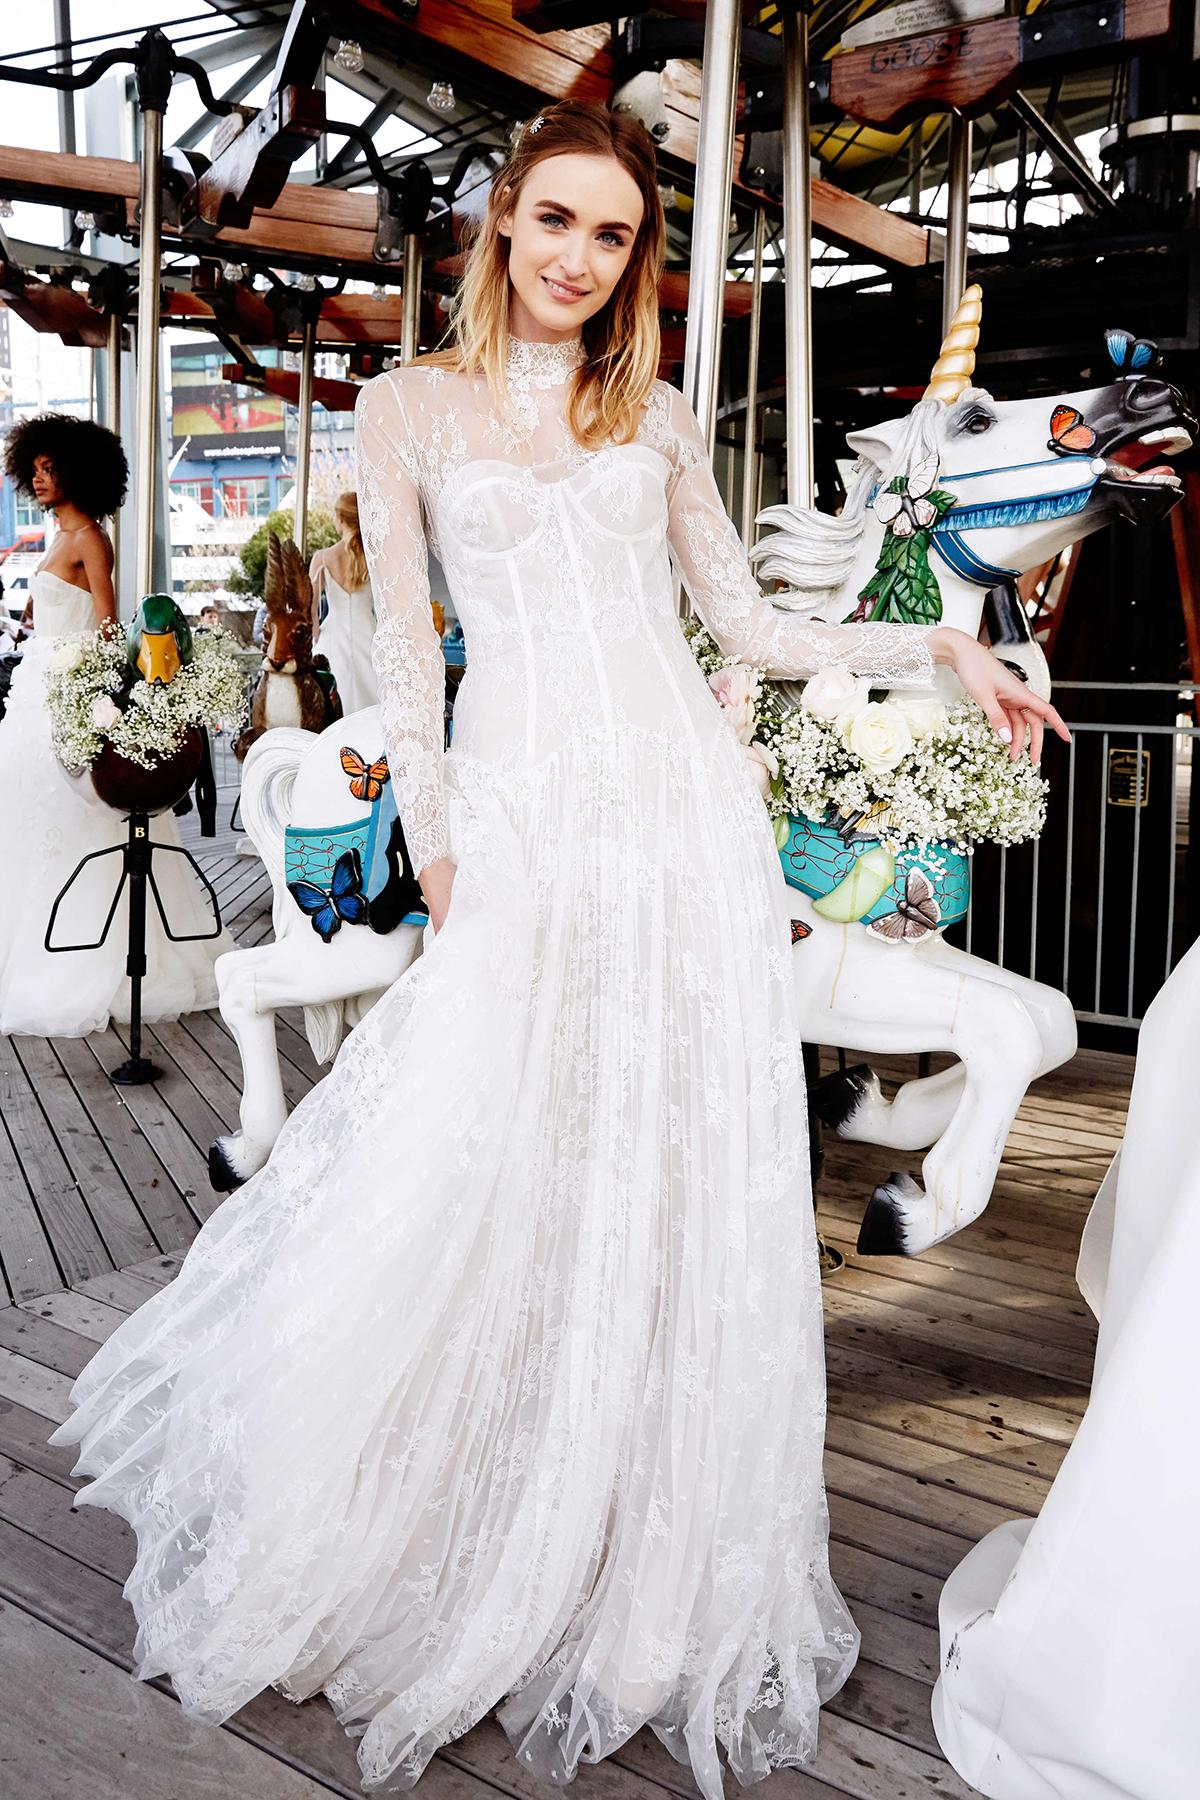 The Highclere gown by Lela Rose Bridal.  Photo credit: Nina Westervelt.